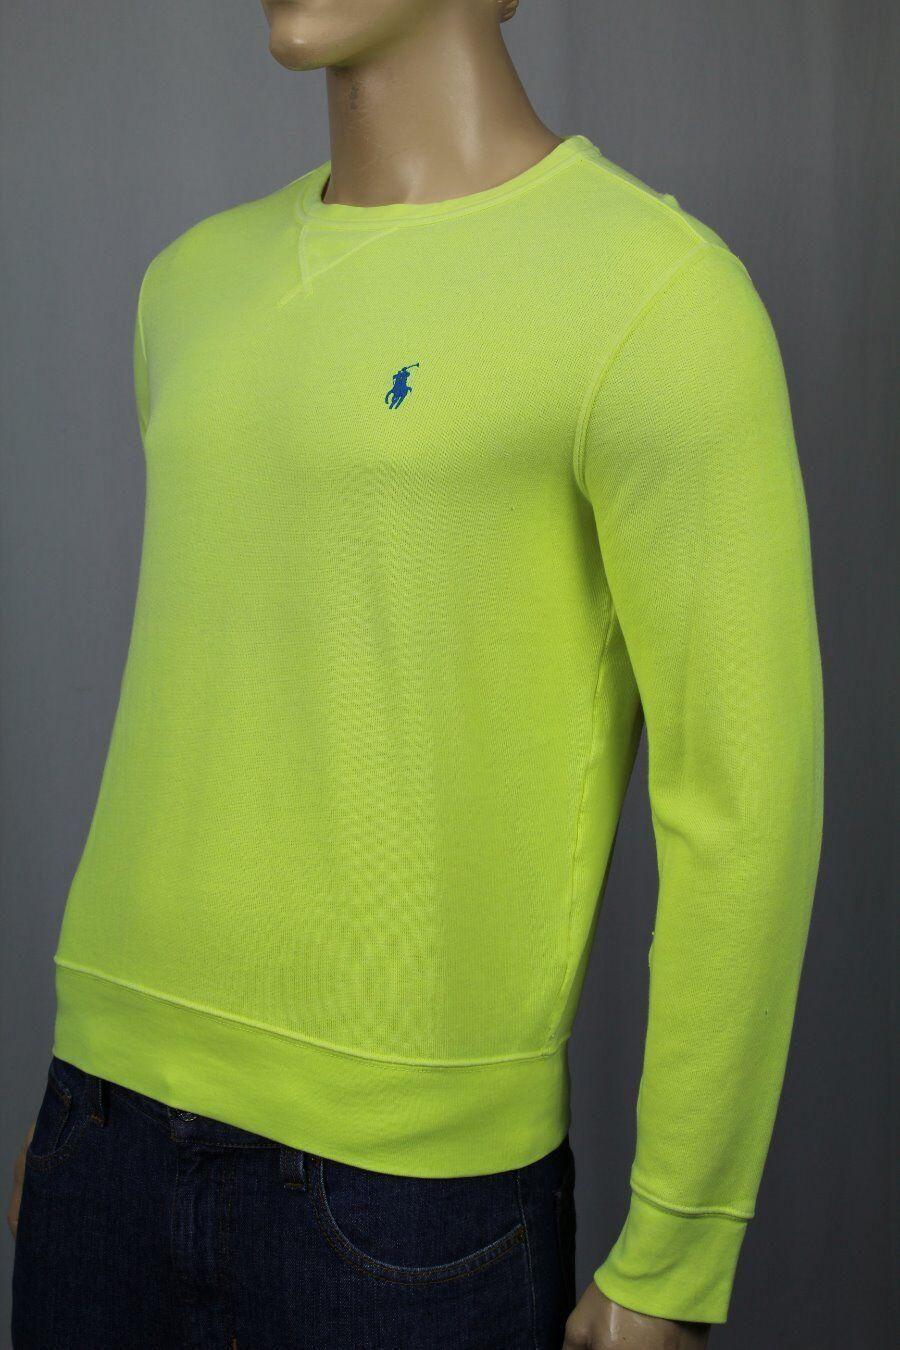 Polo Ralph Lauren Gelb Terry Cloth Cotton Sweatshirt NWT